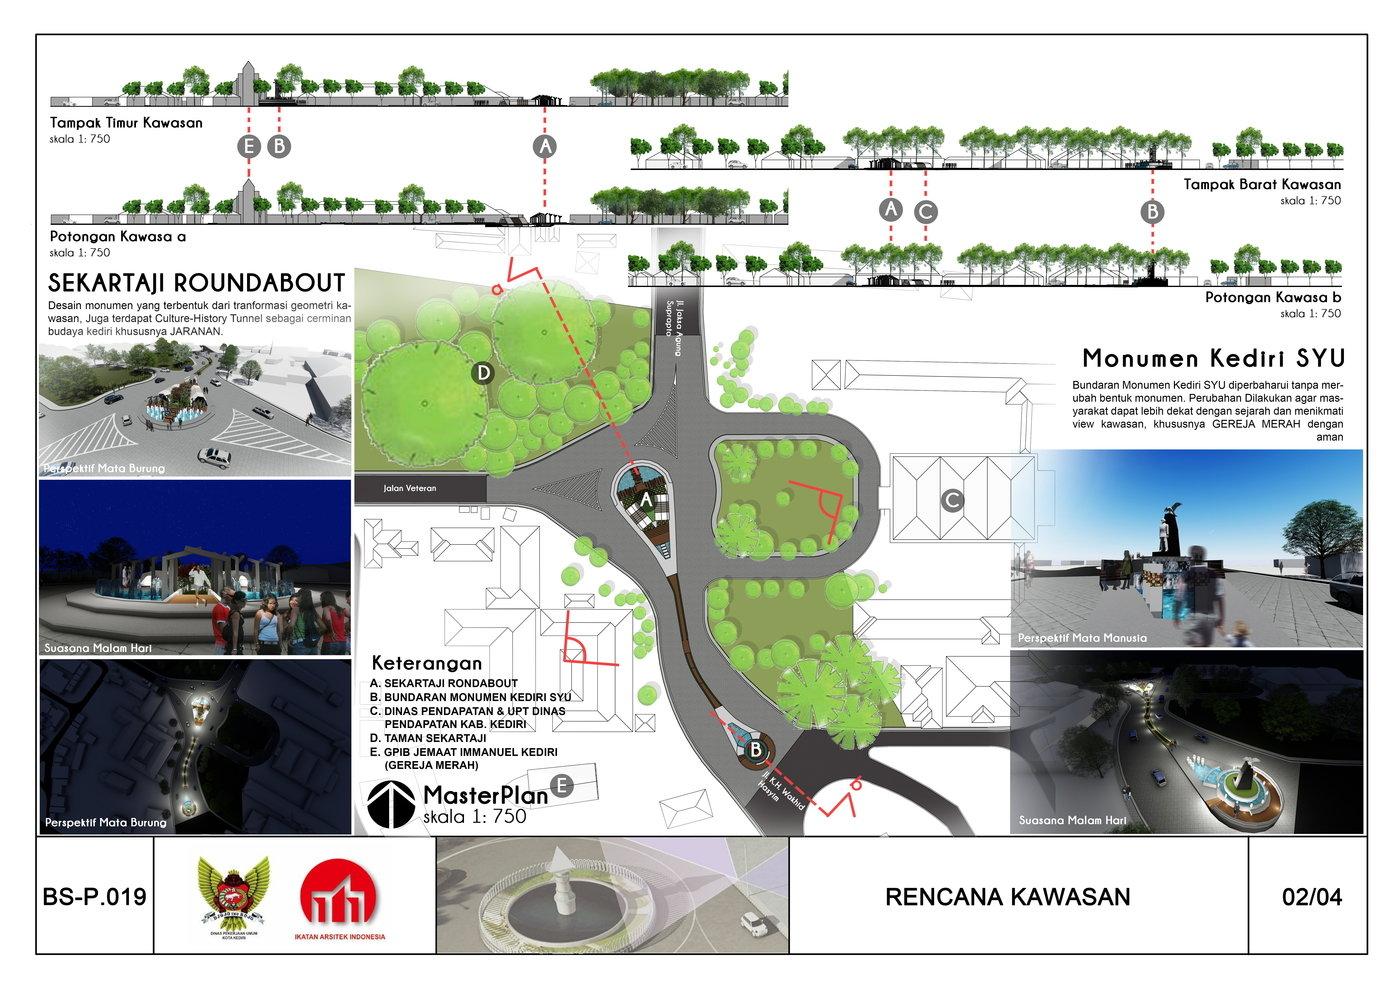 Sayembara Bundaran Sekataji Kediri Sukinsi Sukawruh Coroflot Monumen Syu Kab